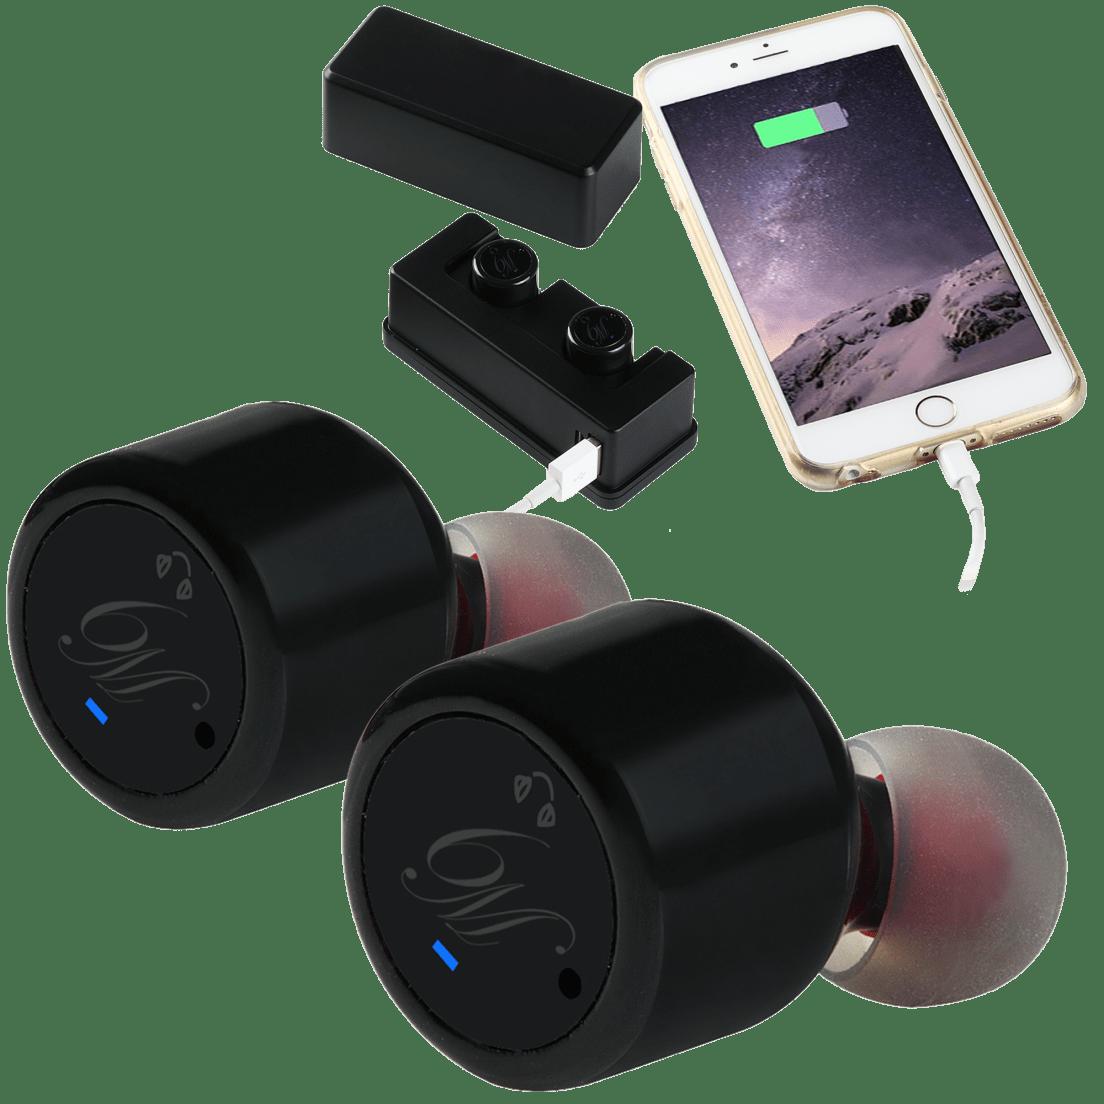 7dab3f1da6d MagicBeatz Pro 6-Hour True Wireless Earbuds and Charging Case